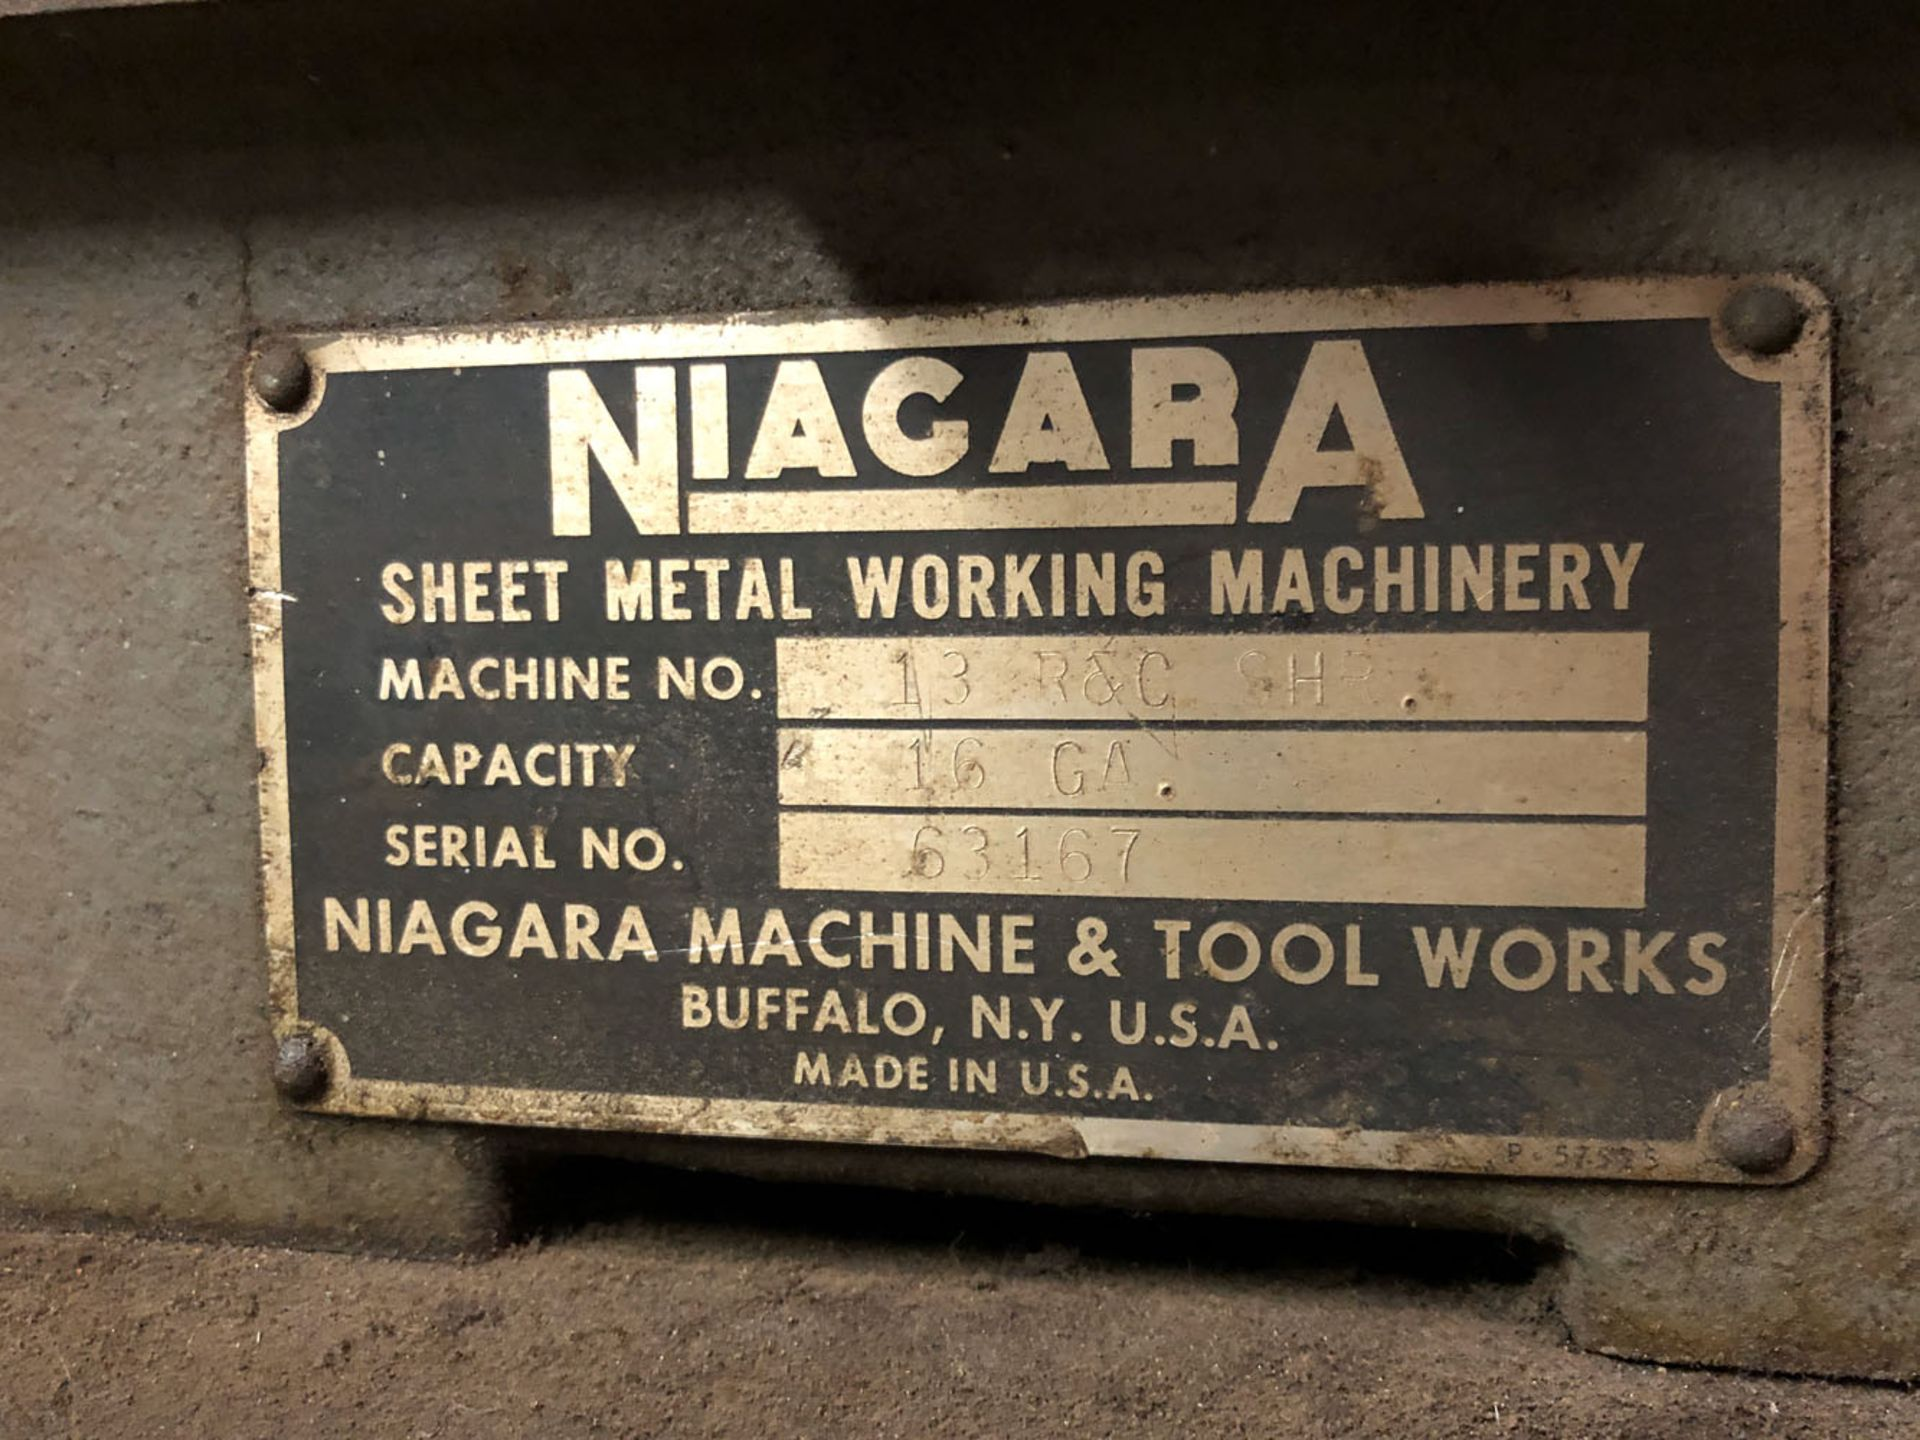 Lot 122 - Punch, Niagara 13 R&C SHR 16 ga. Ser.No. 63167